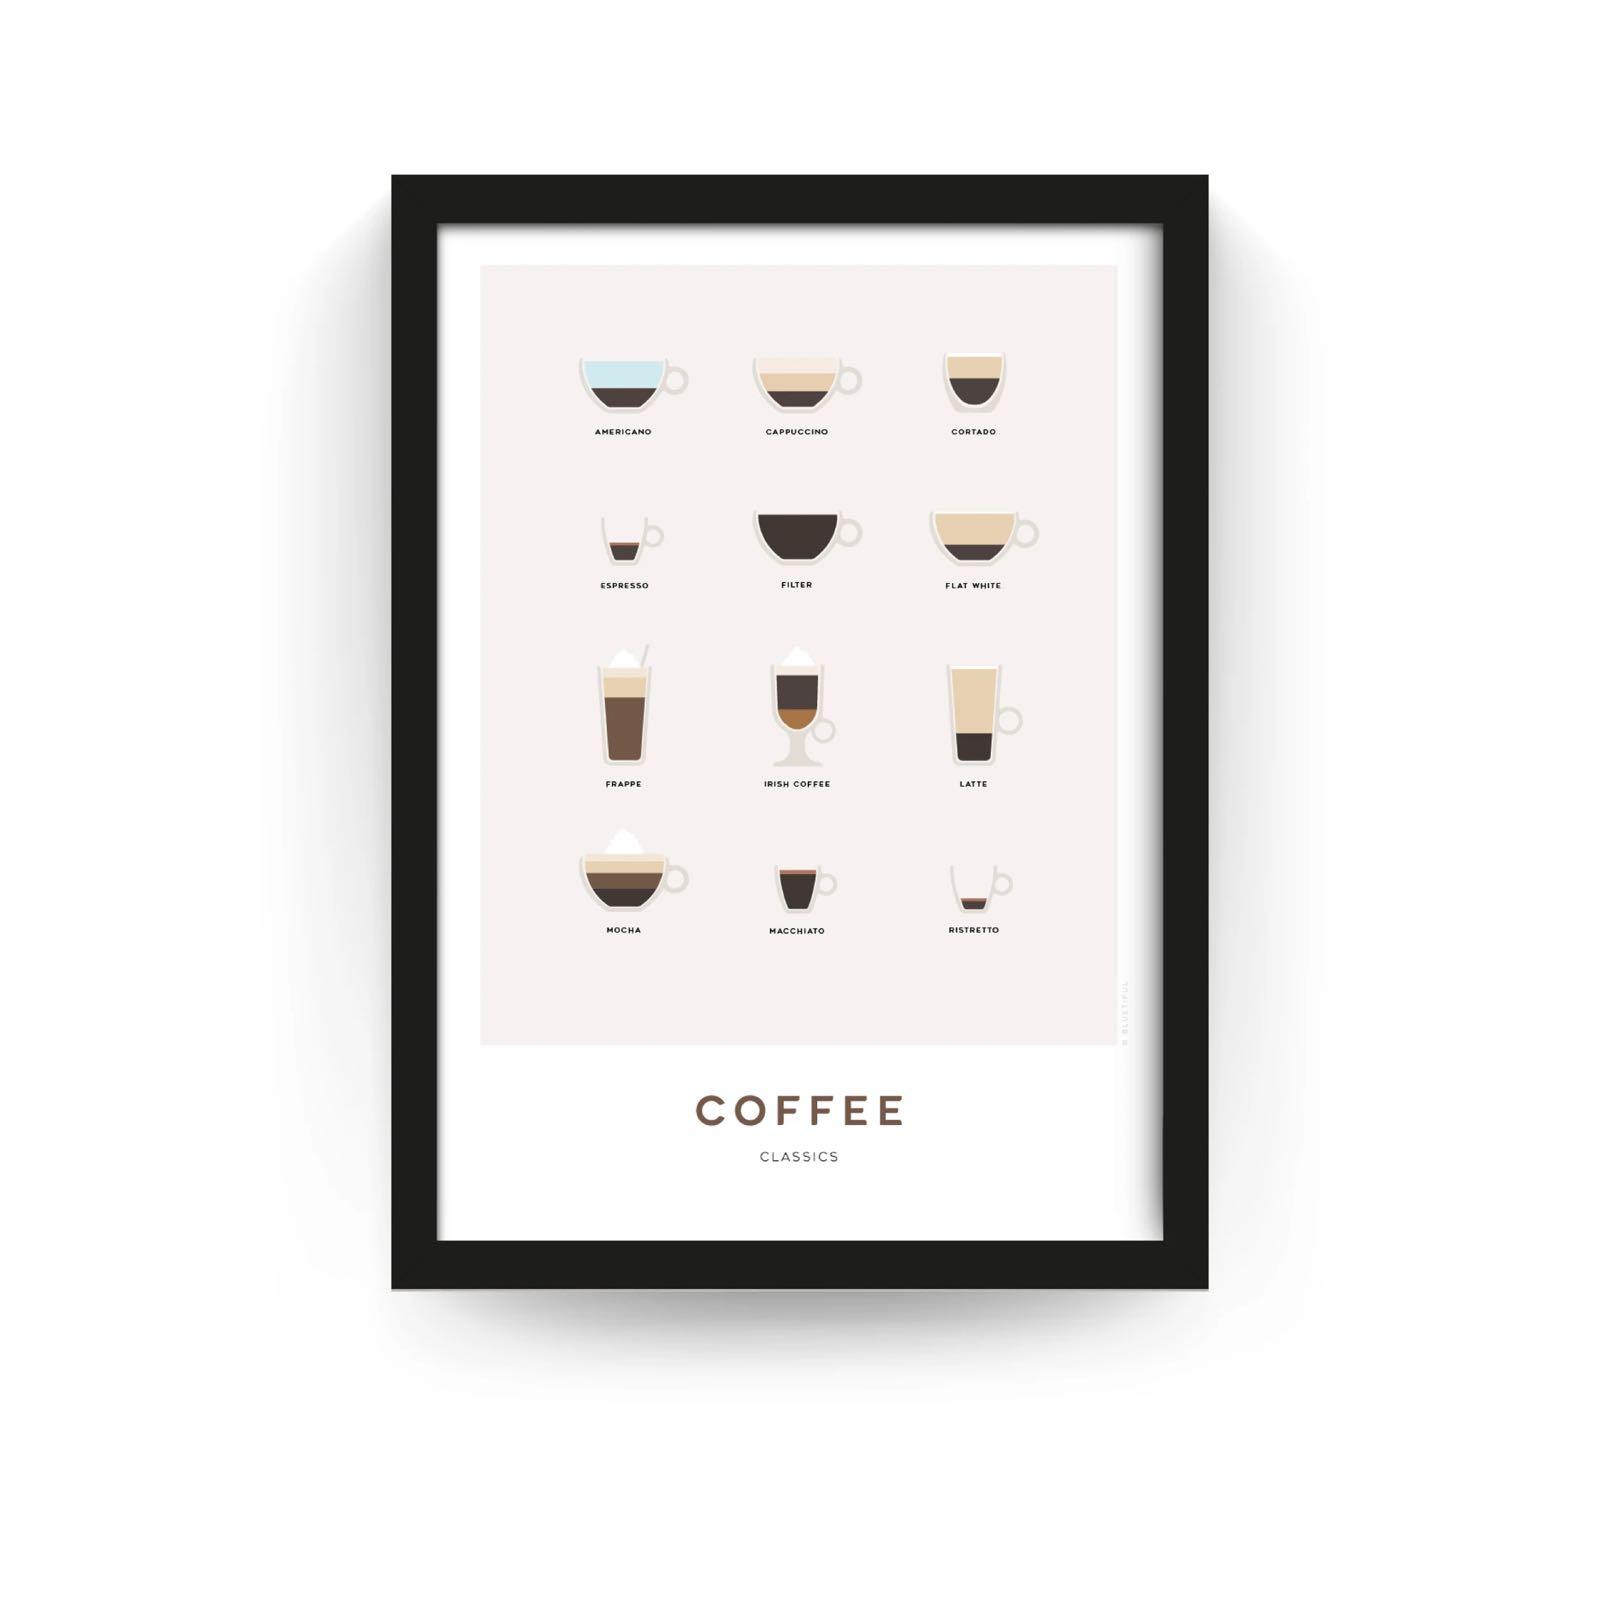 A3 Framed Coffee Print